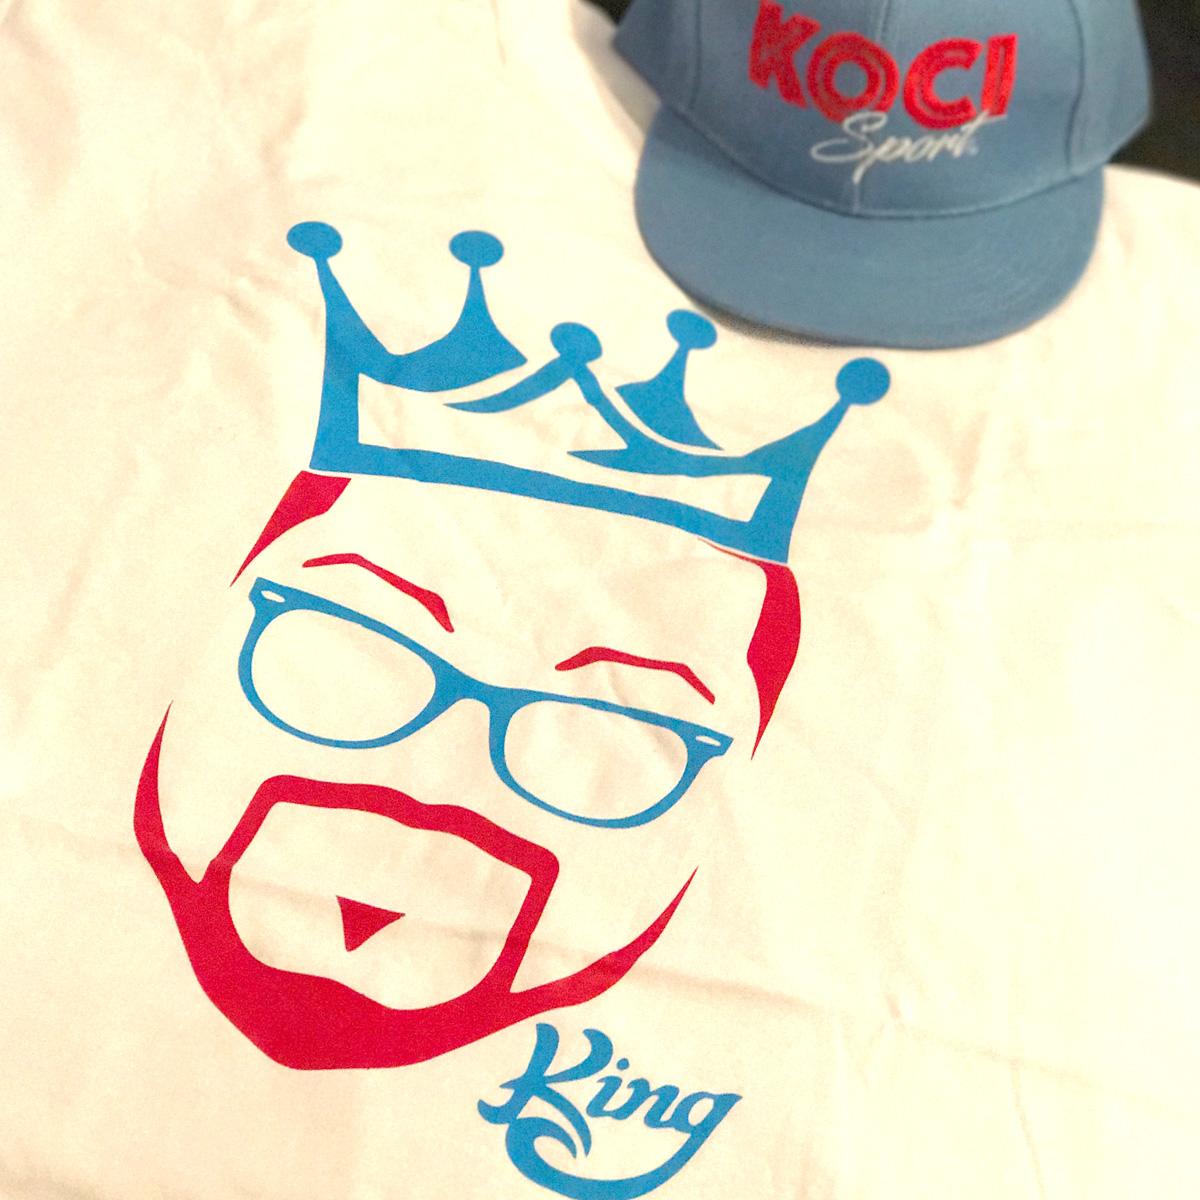 KING & KOCI SPORTS SET